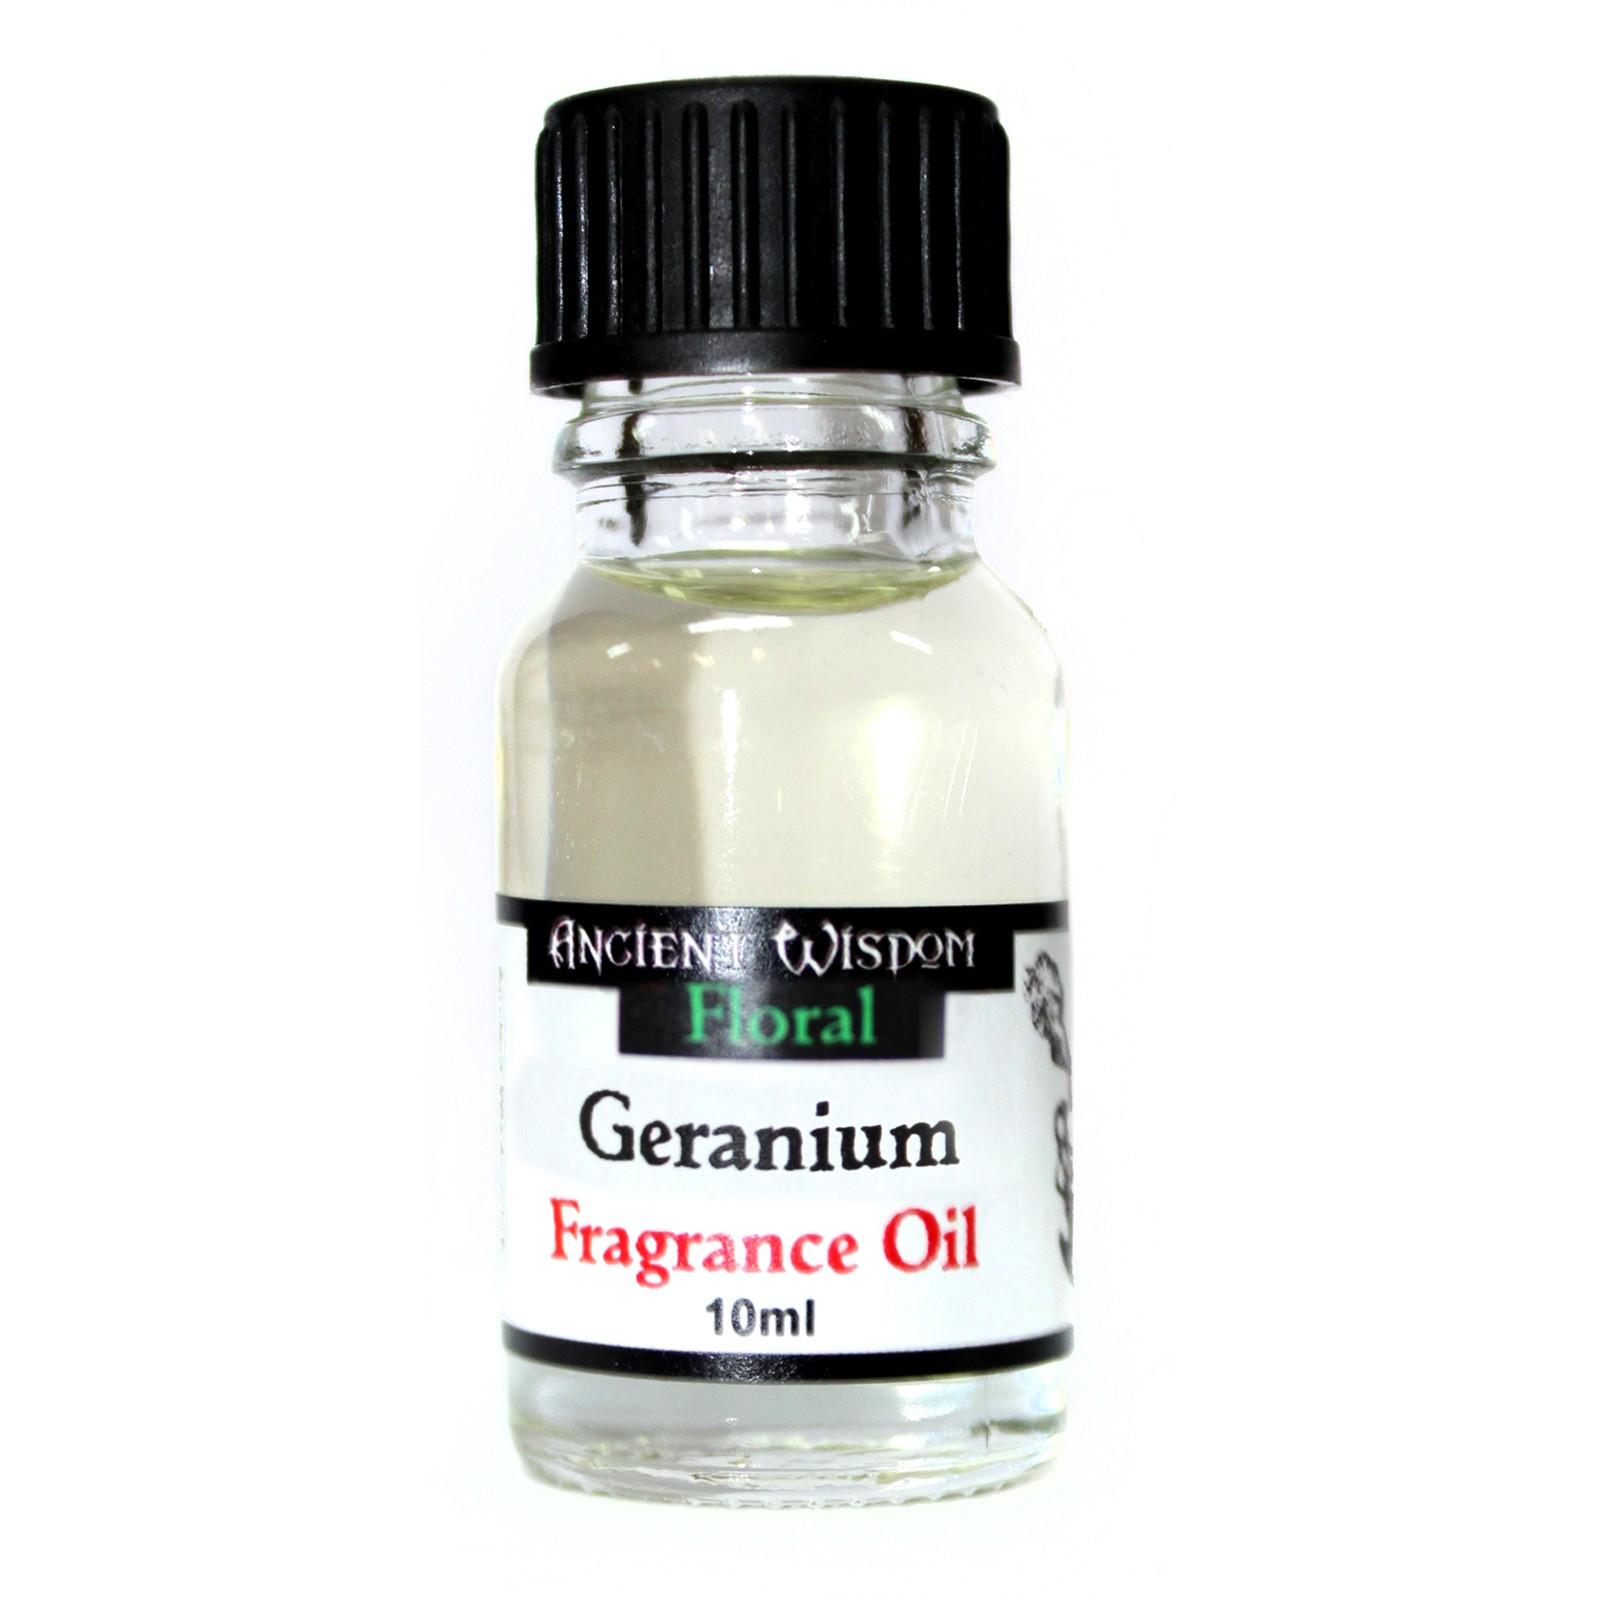 10ml Geranium Fragrance Oil